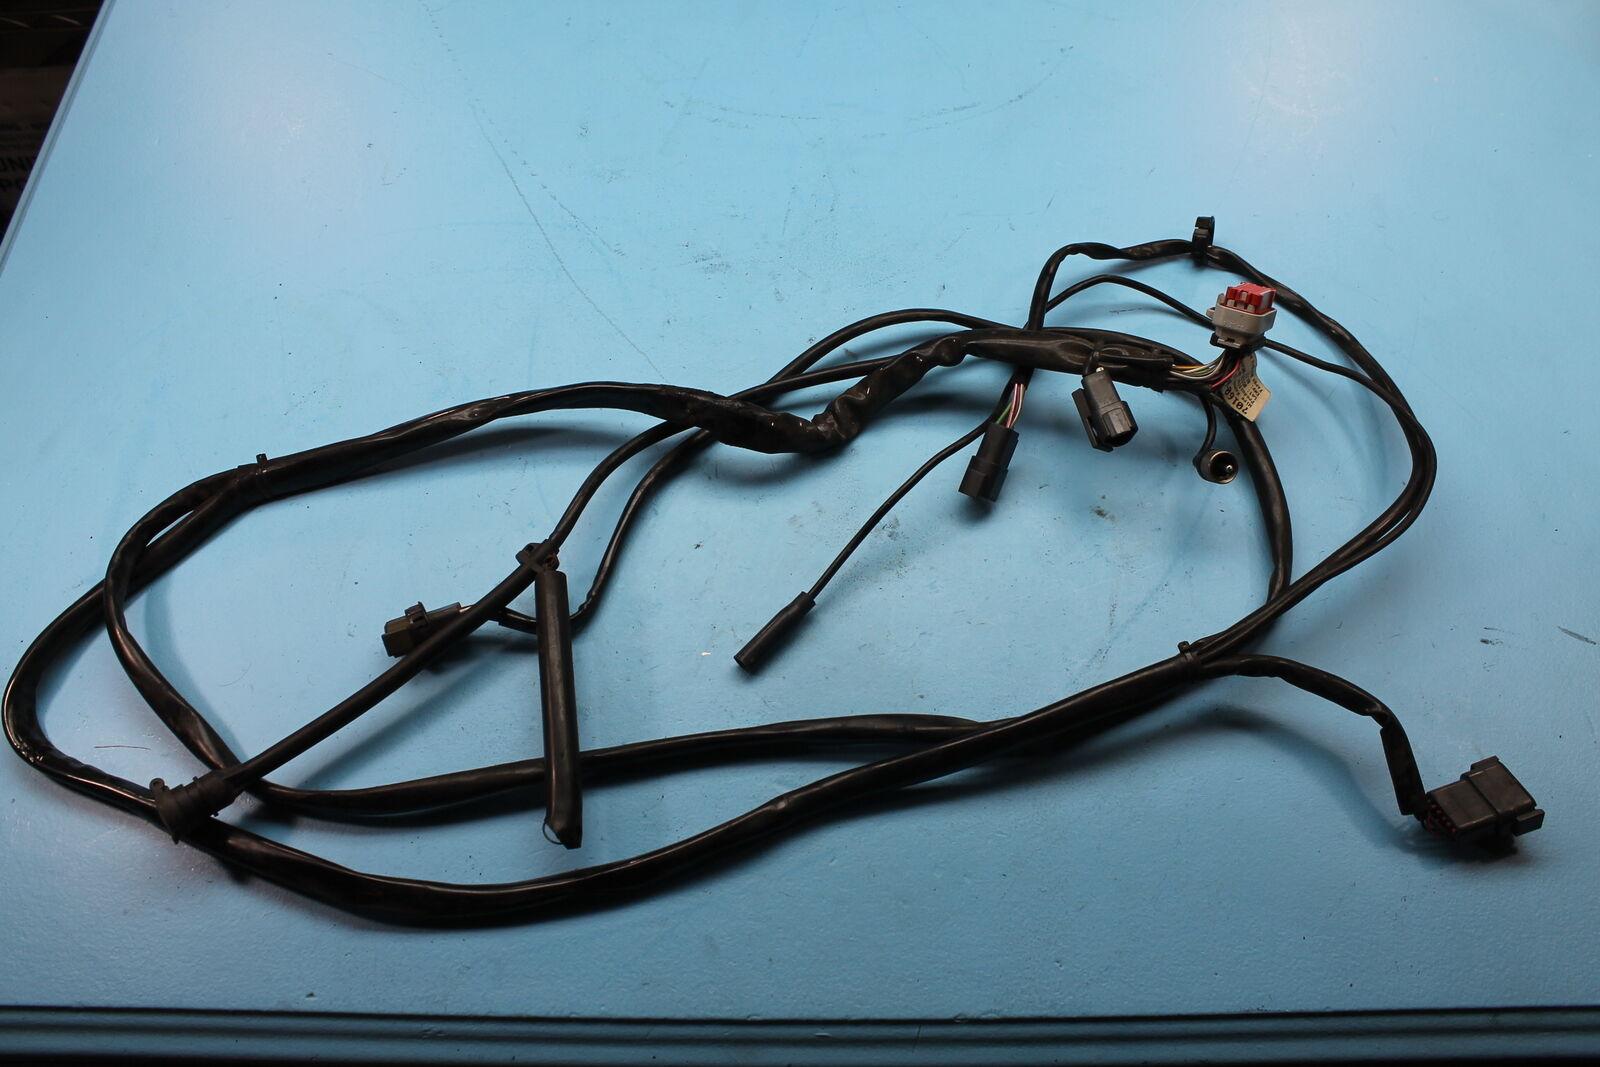 Harley Davidson 1965-69 Sportster XLCH Wiring Harness Complete